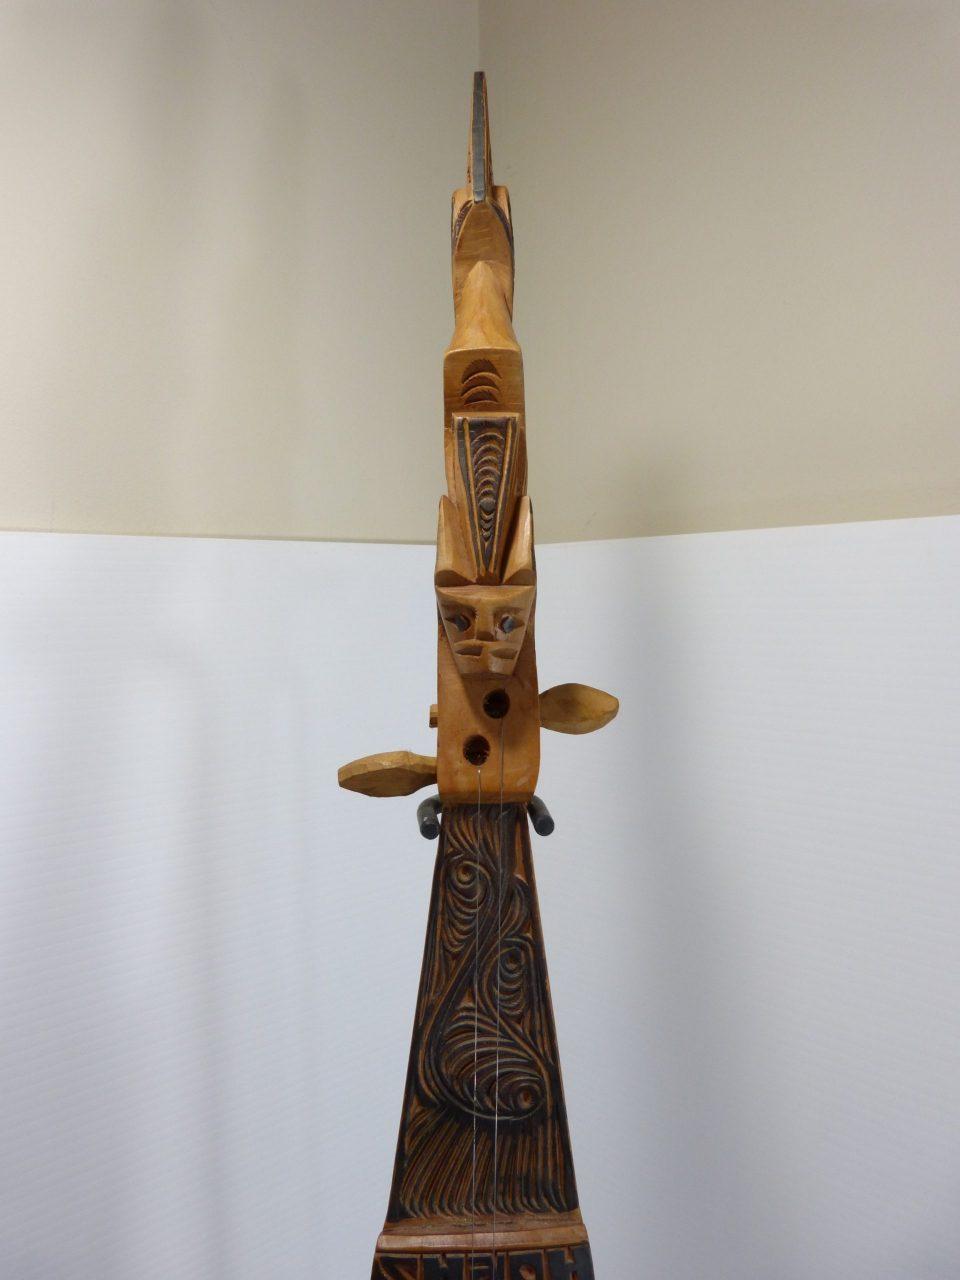 https://www.etsy.com/listing/111888997/kacapi-ornamental-handcarved-boat-lute?show_sold_out_detail=1&ref=nla_listing_details